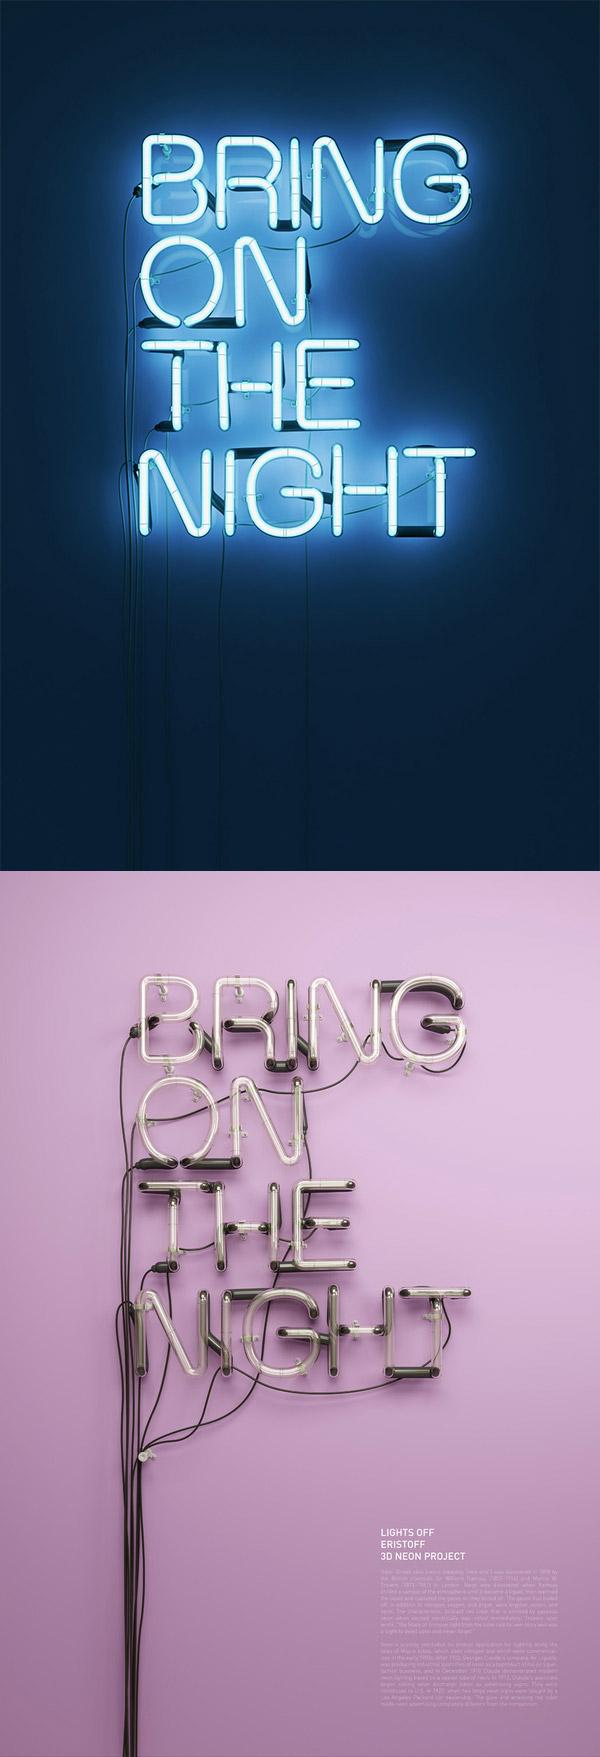 Eristoff Neon Campaign by Rizon Parein